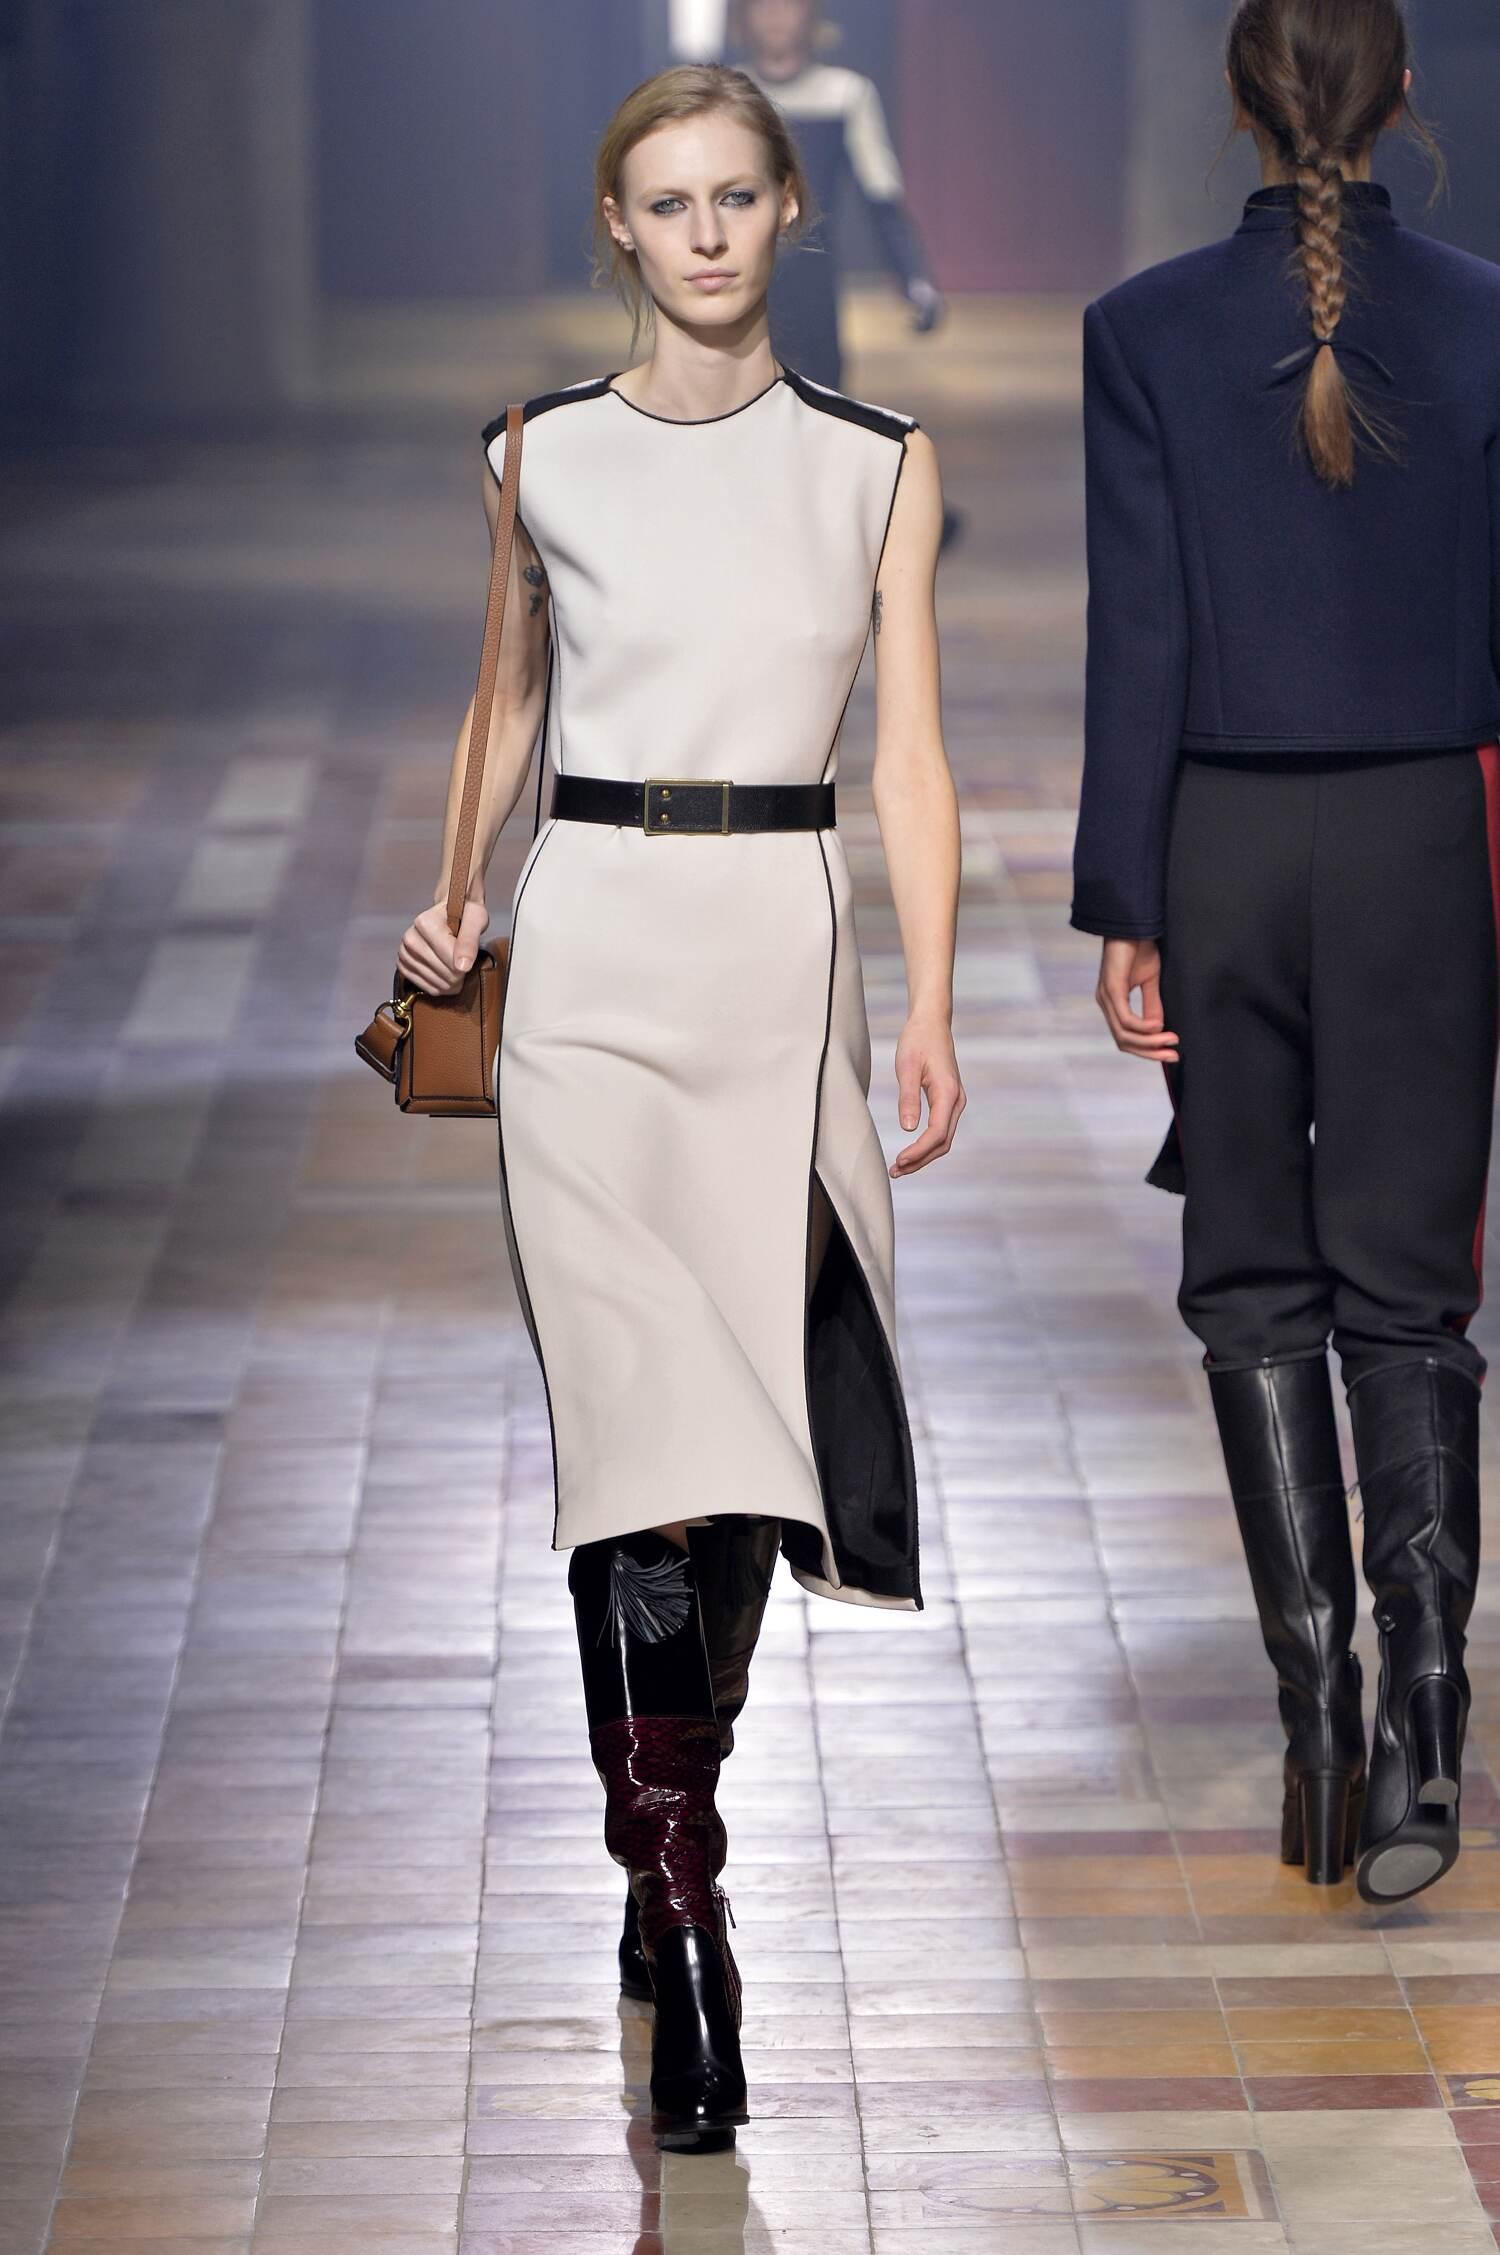 Winter 2015 Fashion Show Lanvin Collection